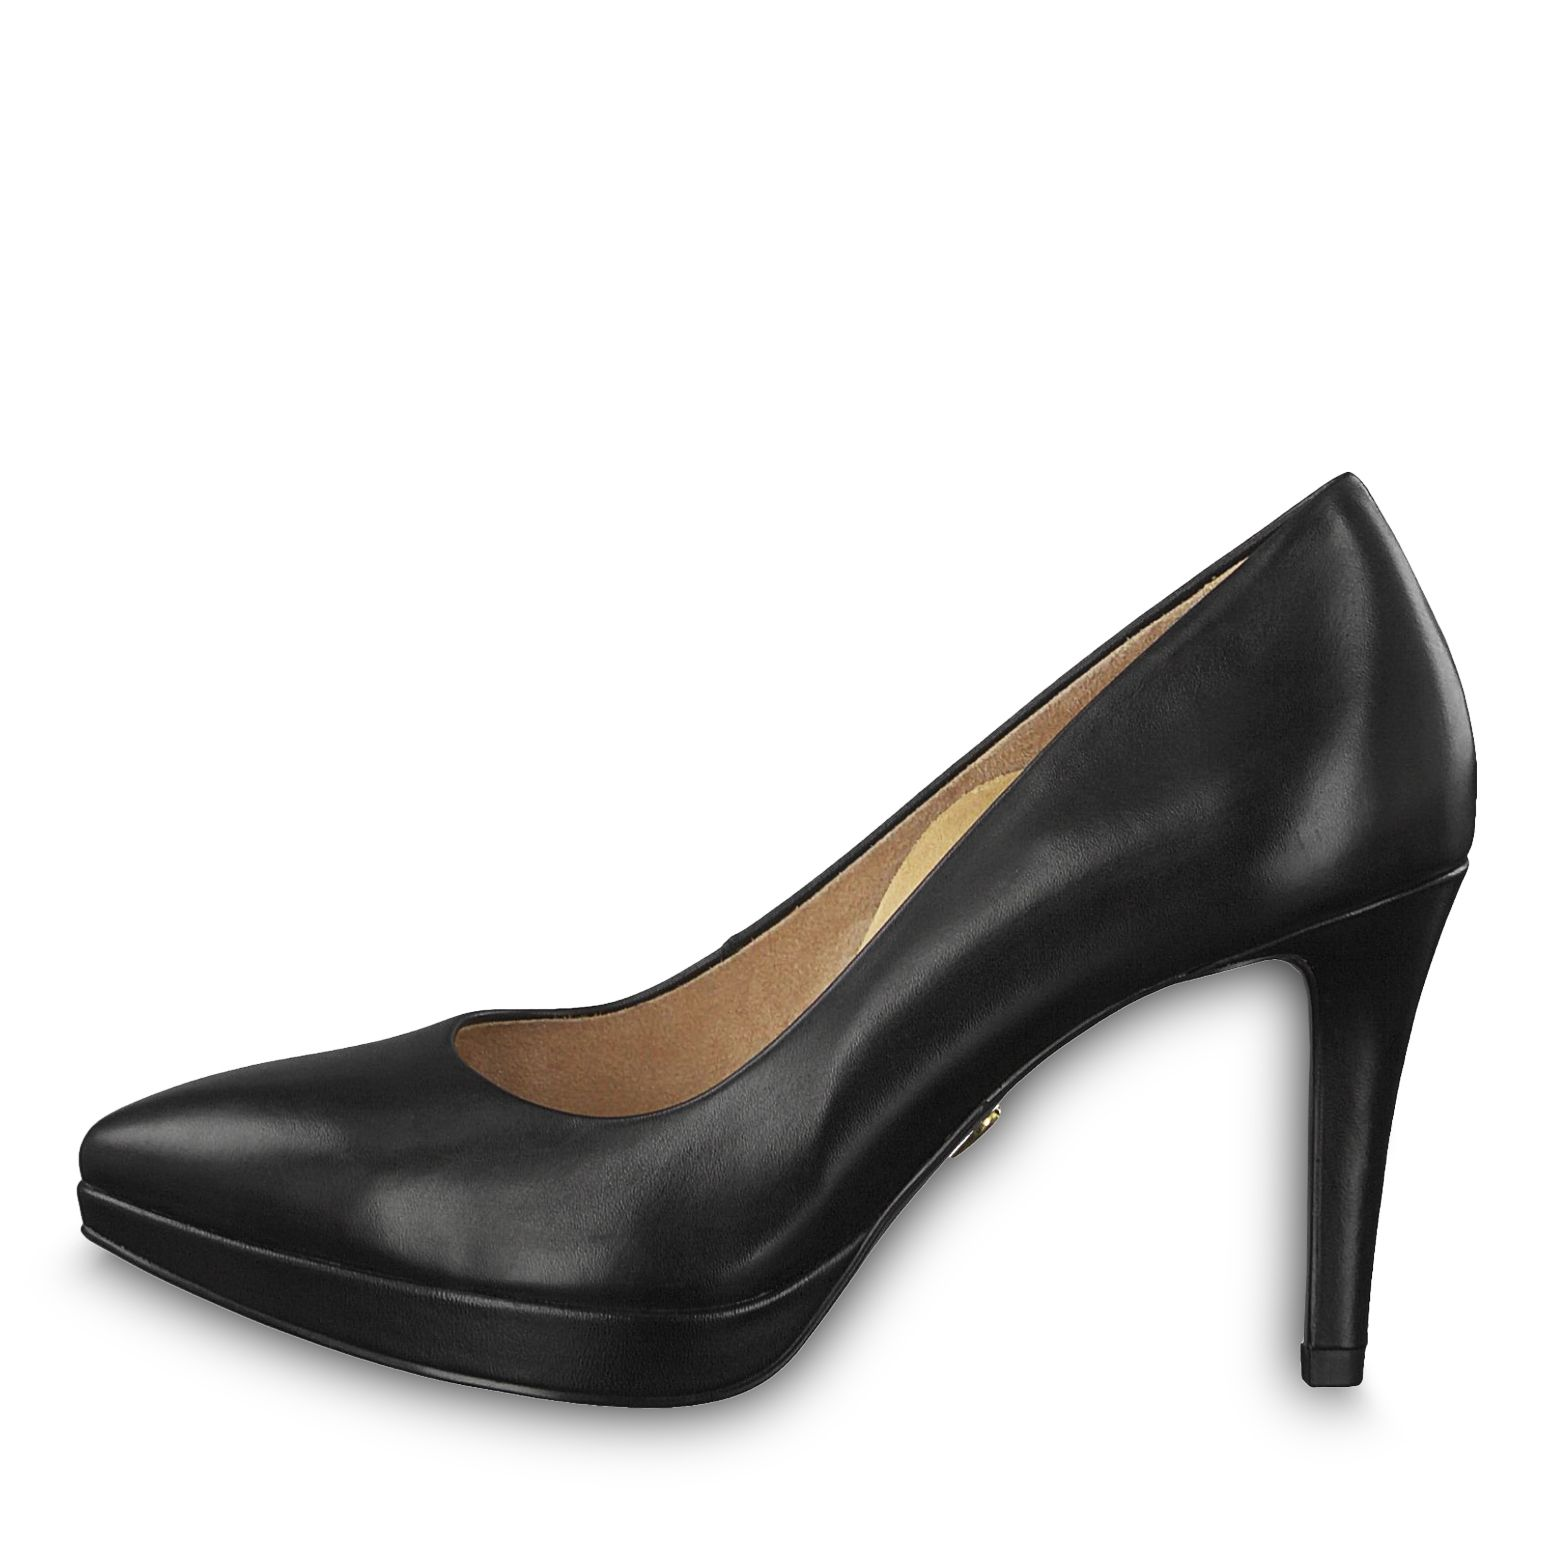 elouise 1 1 22402 29 buy tamaris high heels online. Black Bedroom Furniture Sets. Home Design Ideas